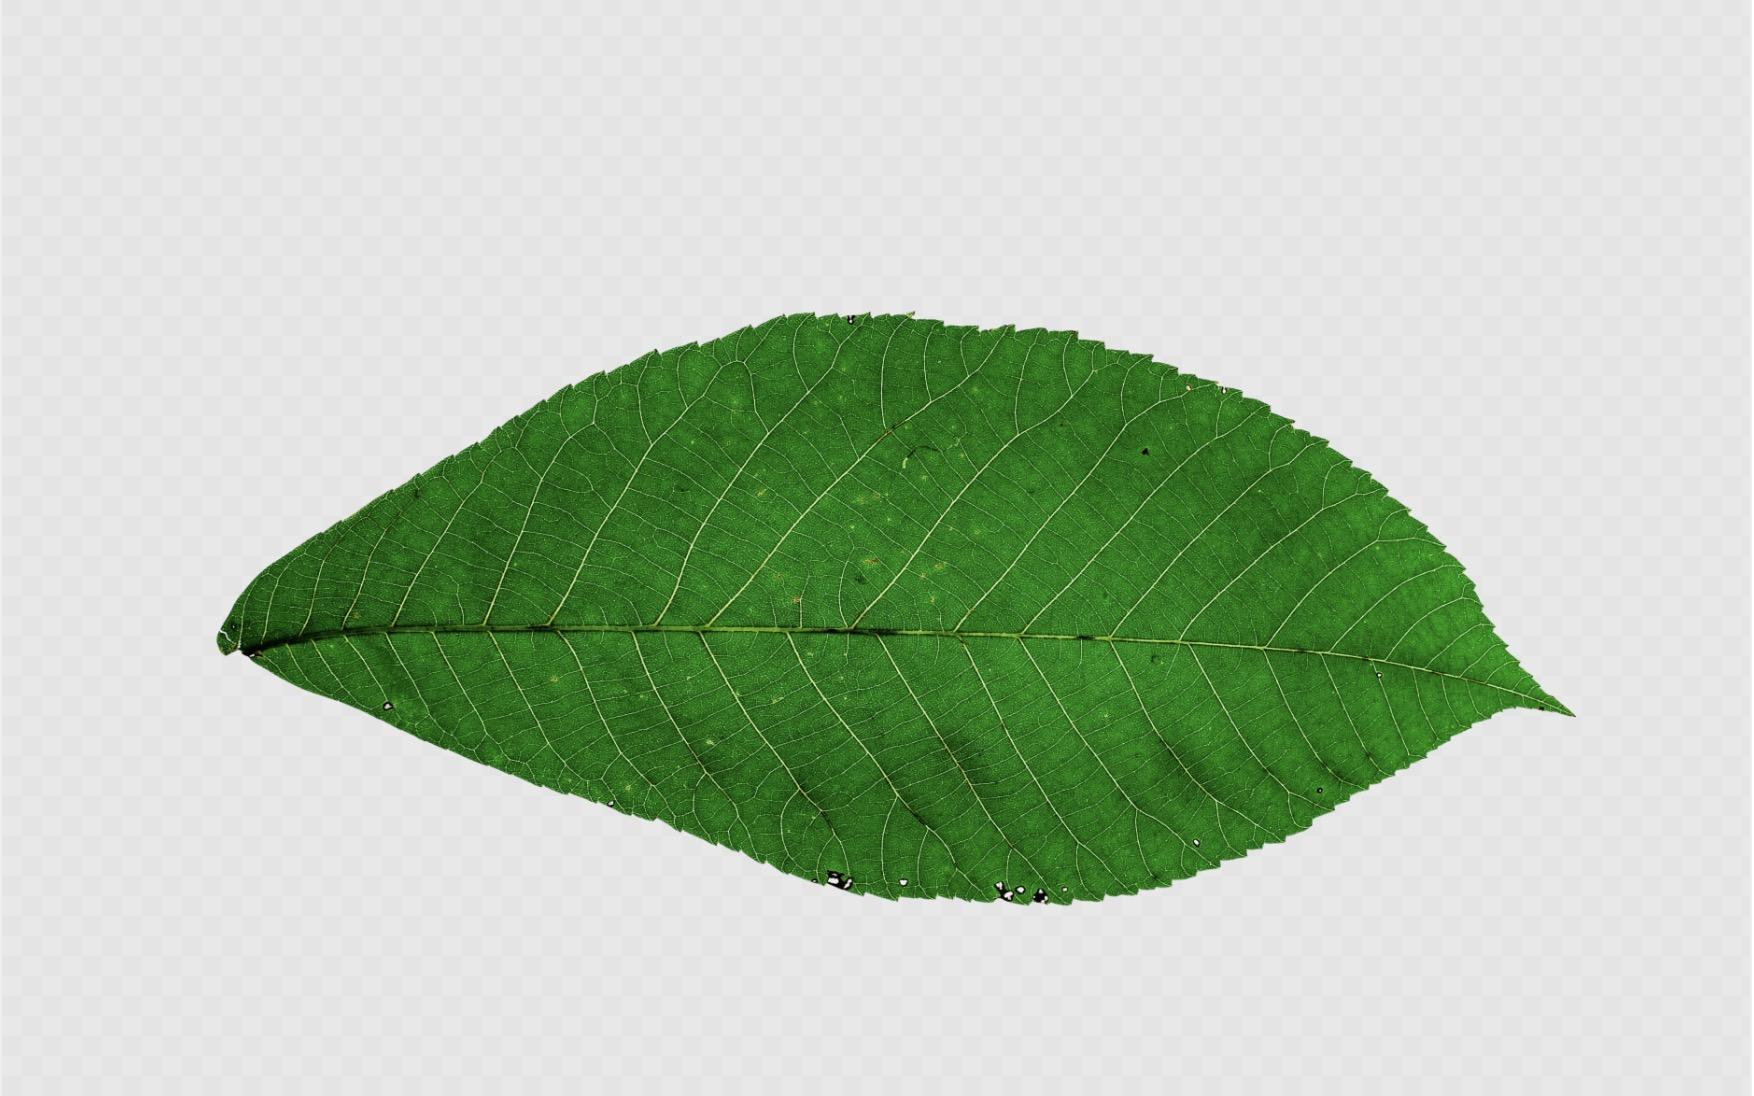 Transparent Fall Leaf Clipart No Background - Fall Leaves Png Transparent,  Png Download - kindpng